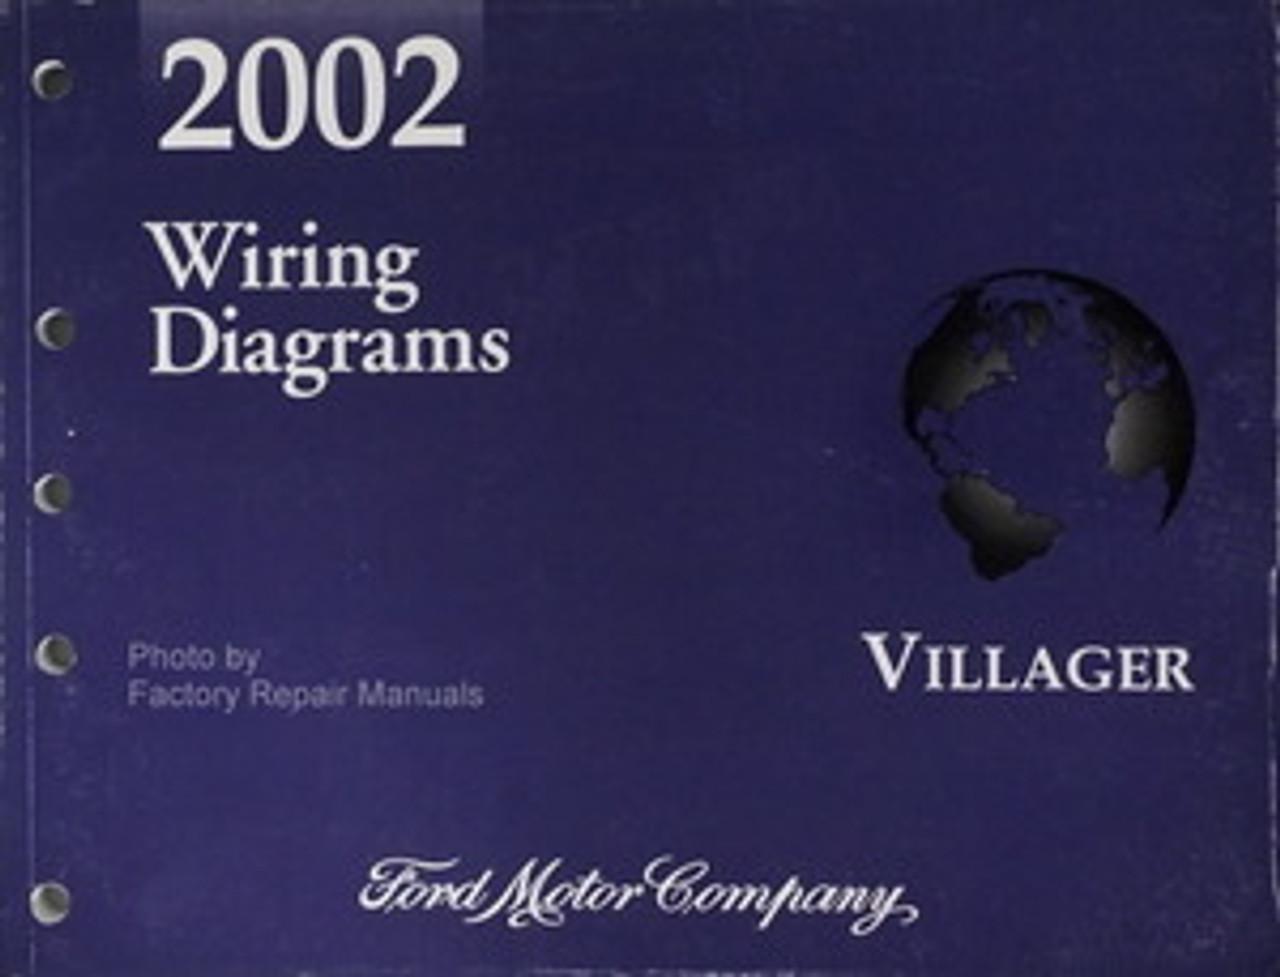 2002 Mercury Villager Electrical Wiring Diagrams Original